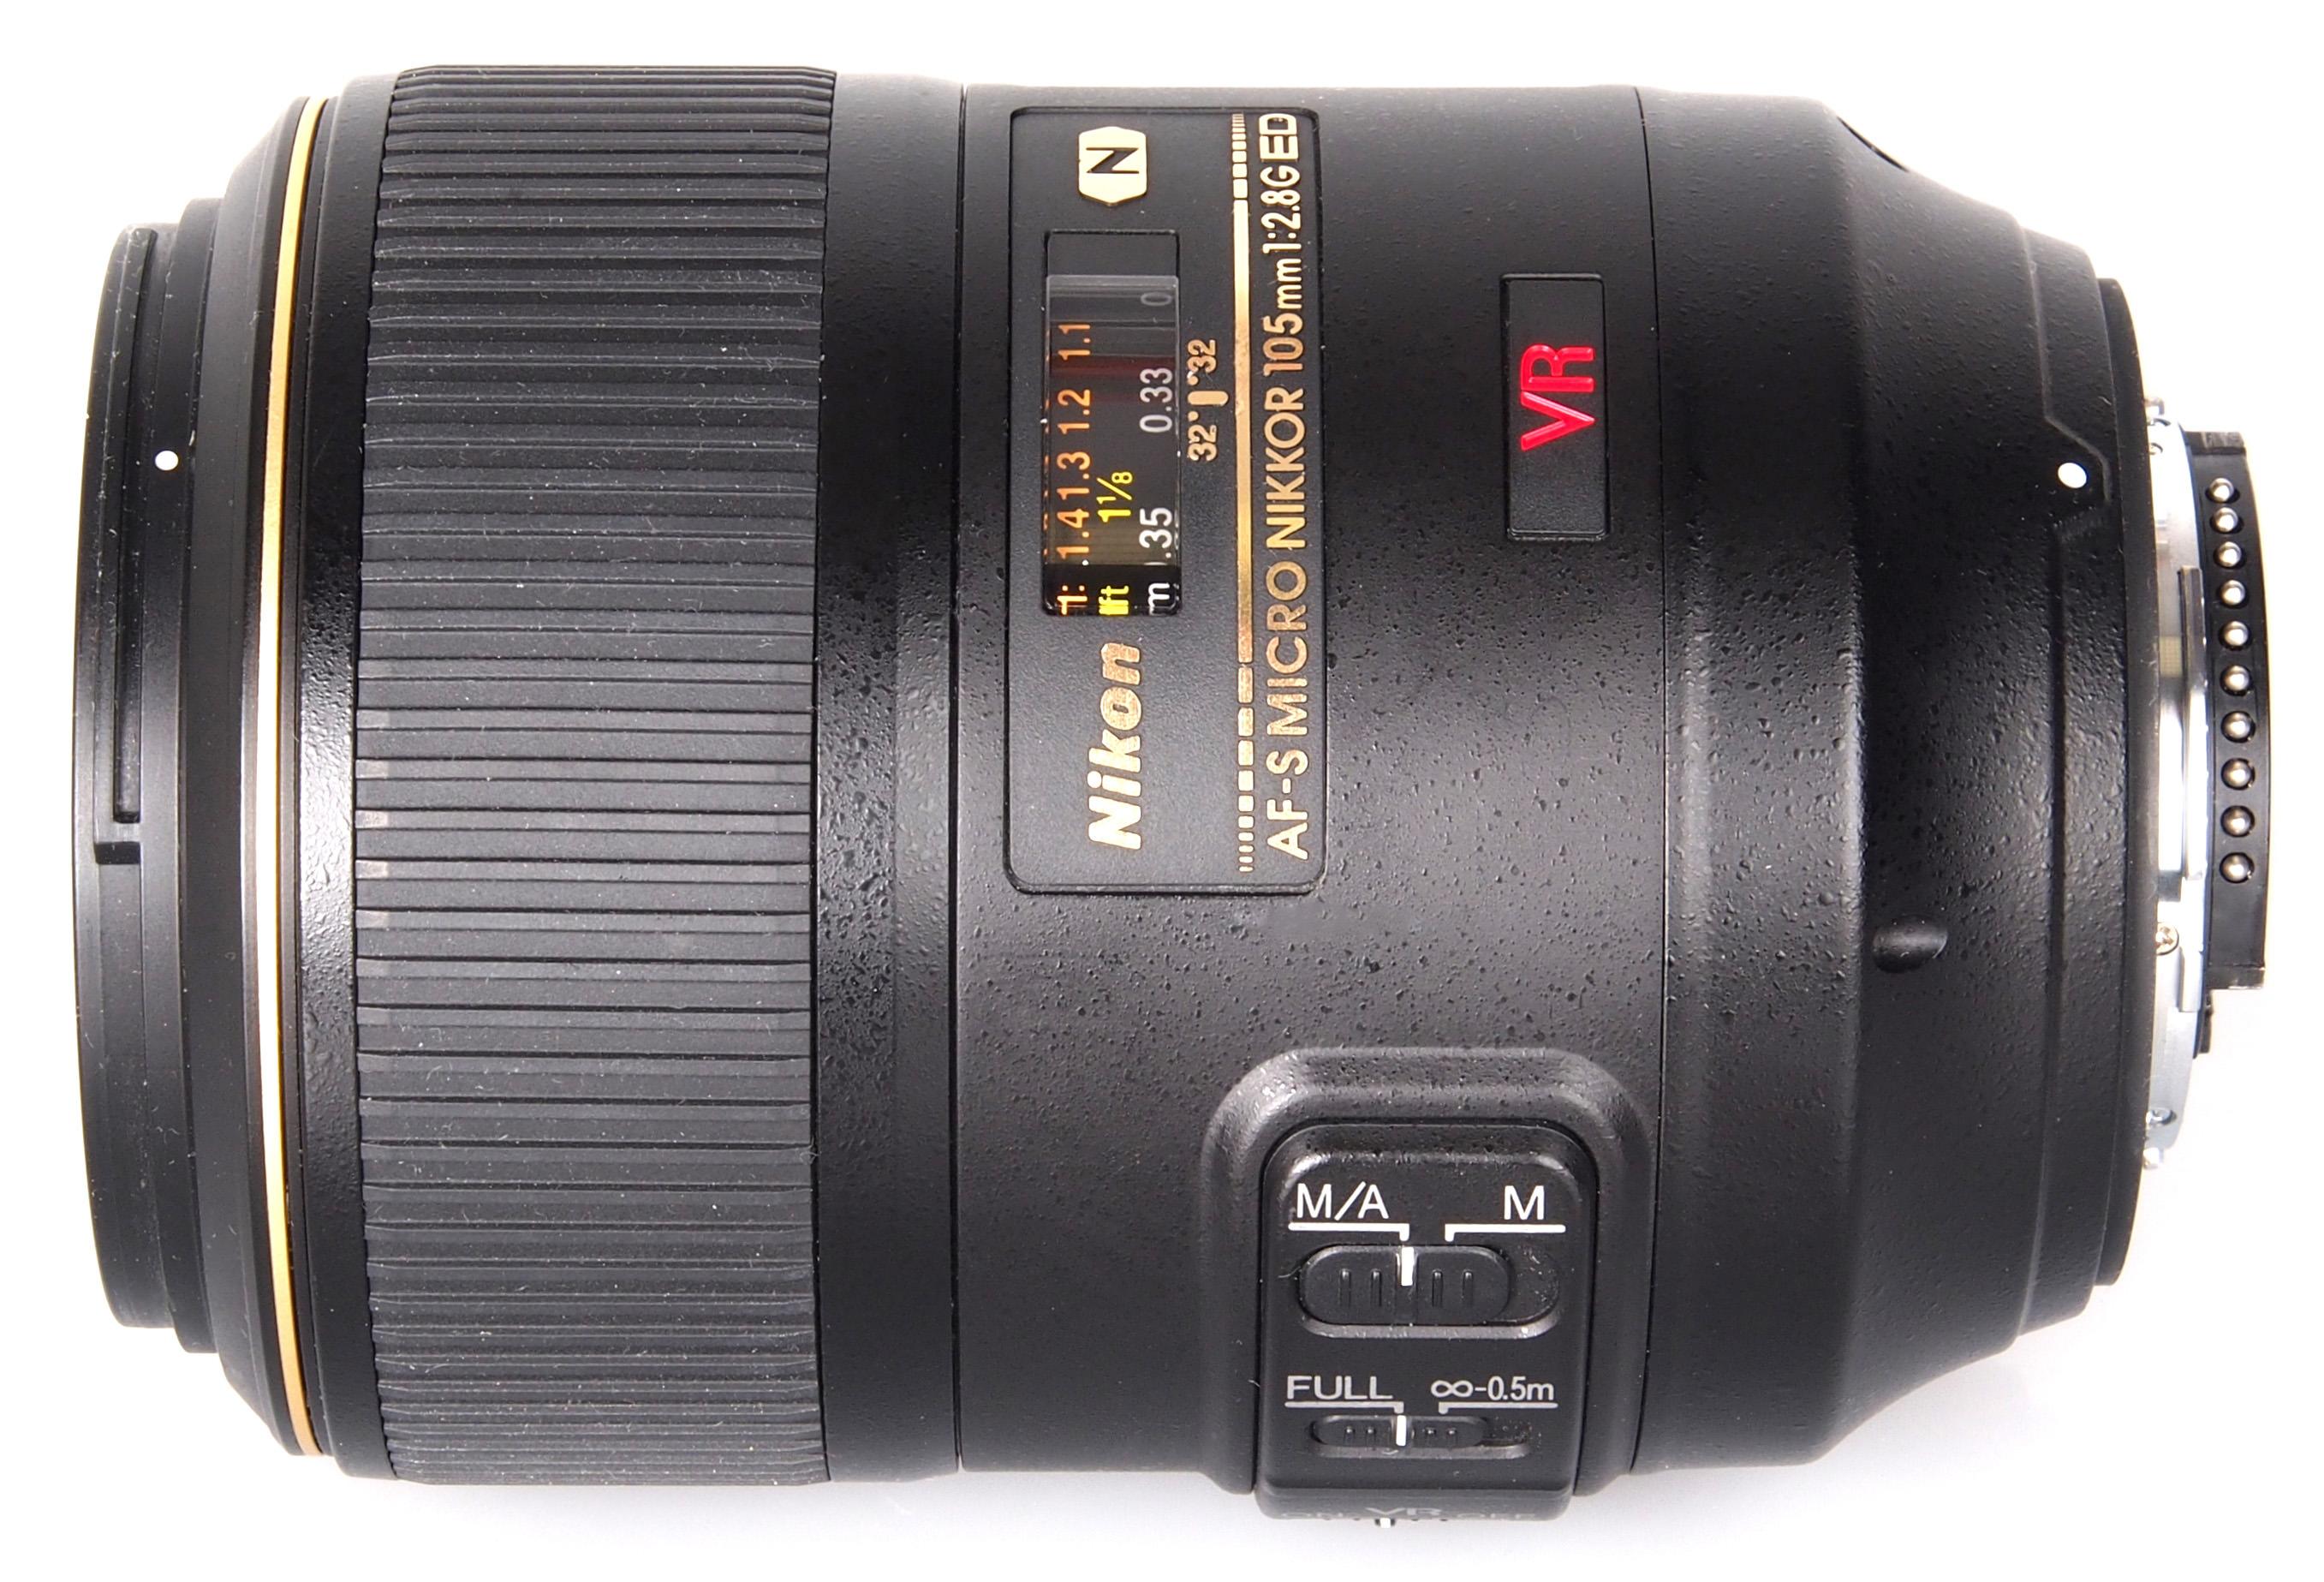 top 18 best lenses for macro photography 2018 rh ephotozine com Best Lens for Macro Photography nikon micro 105mm f/4.0 ai manual focus macro lens